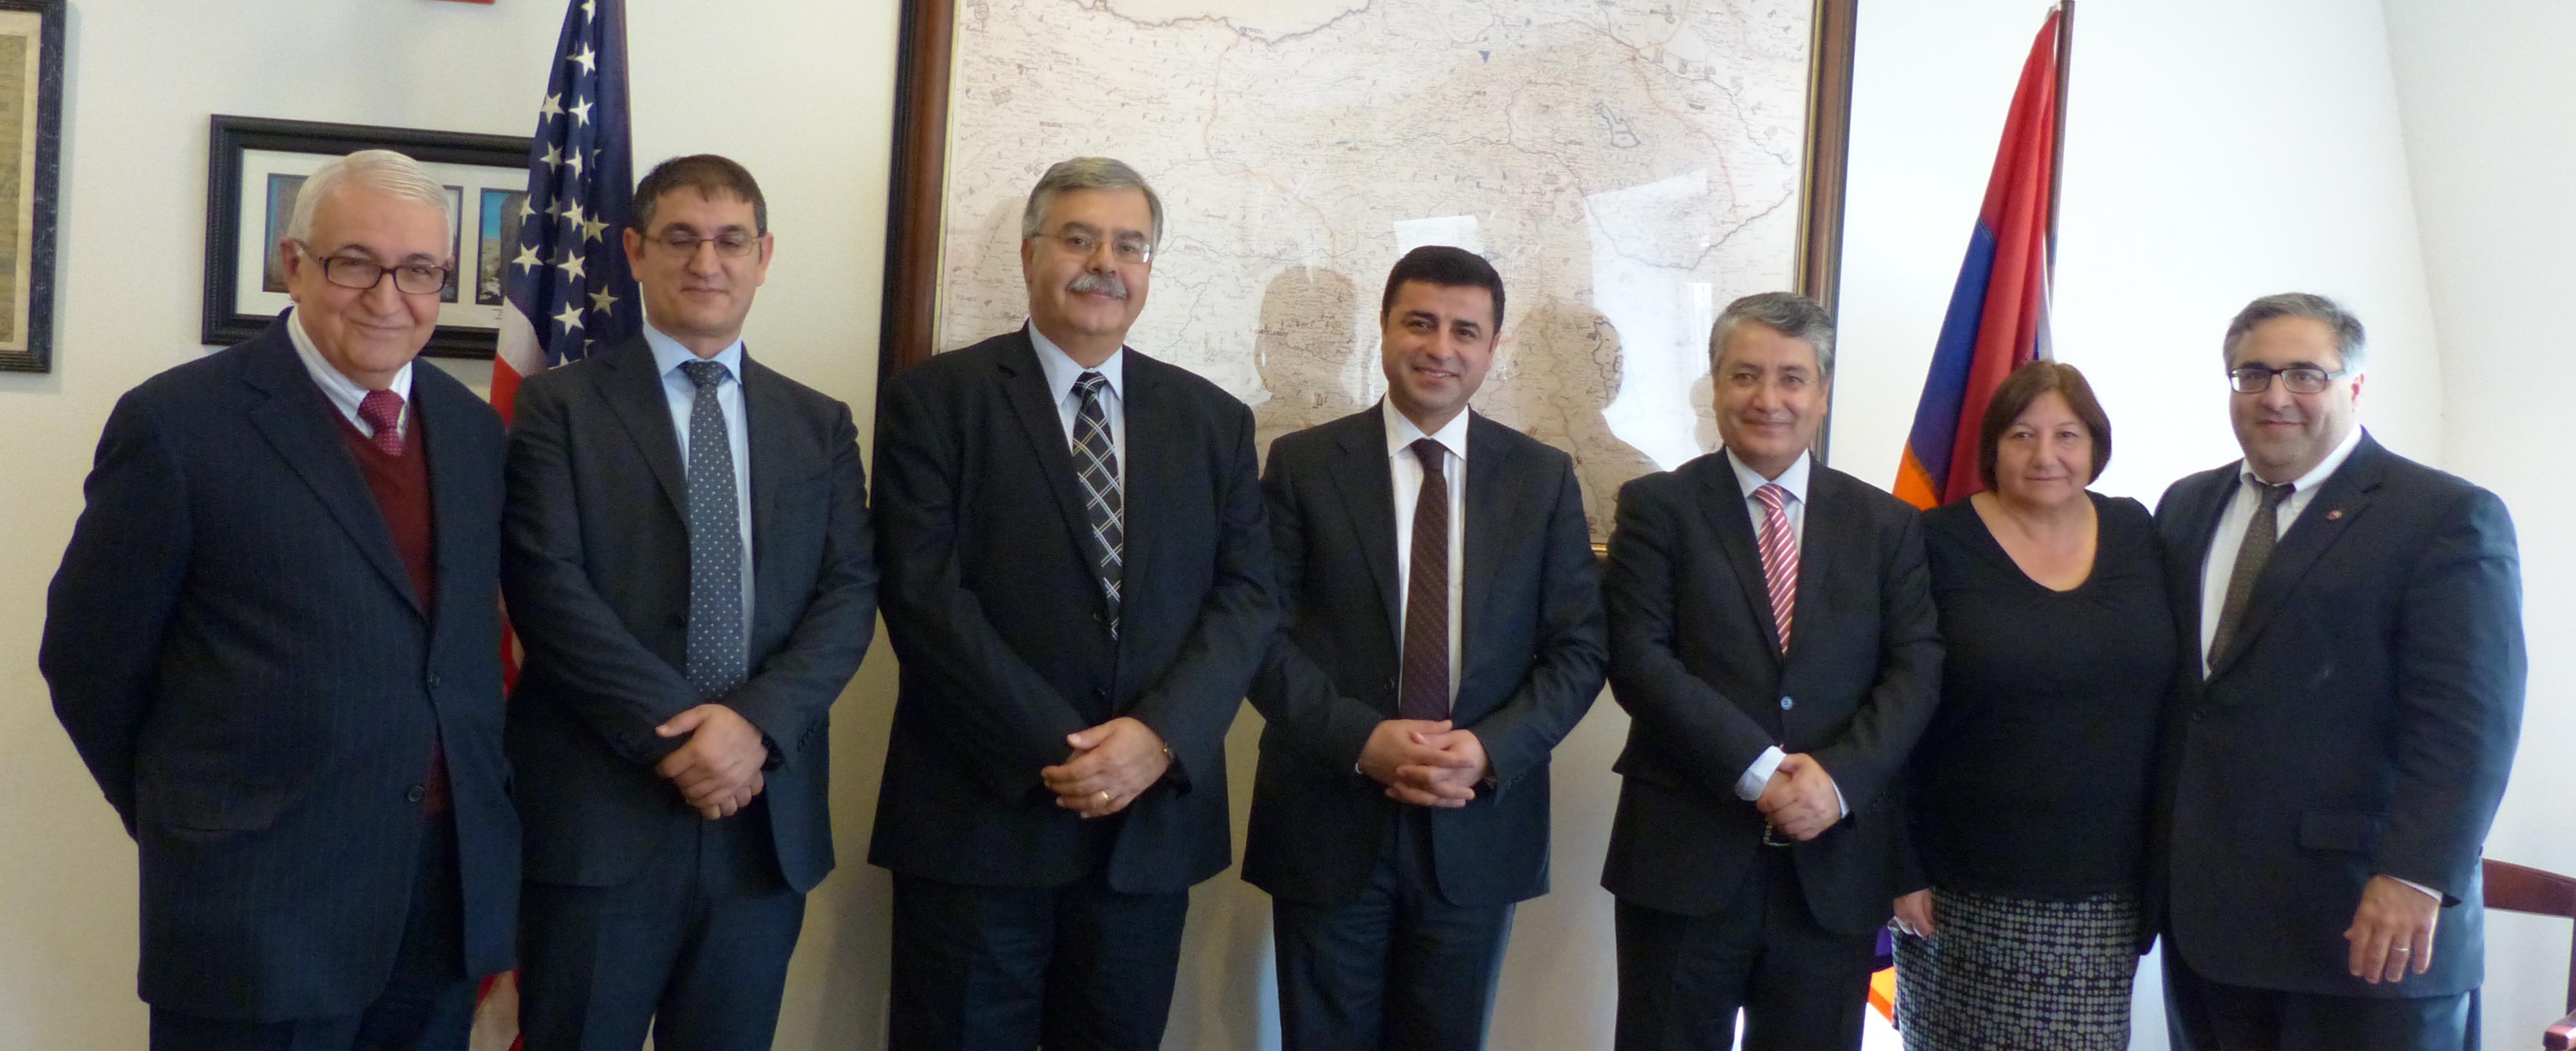 (L-R) Garo Armenian, Mehmet Yüksel, Hagop Der Khachadourian, Selahattin Demirtaş, Nazmi Gür, Ani Haroyian, Aram Hamparian